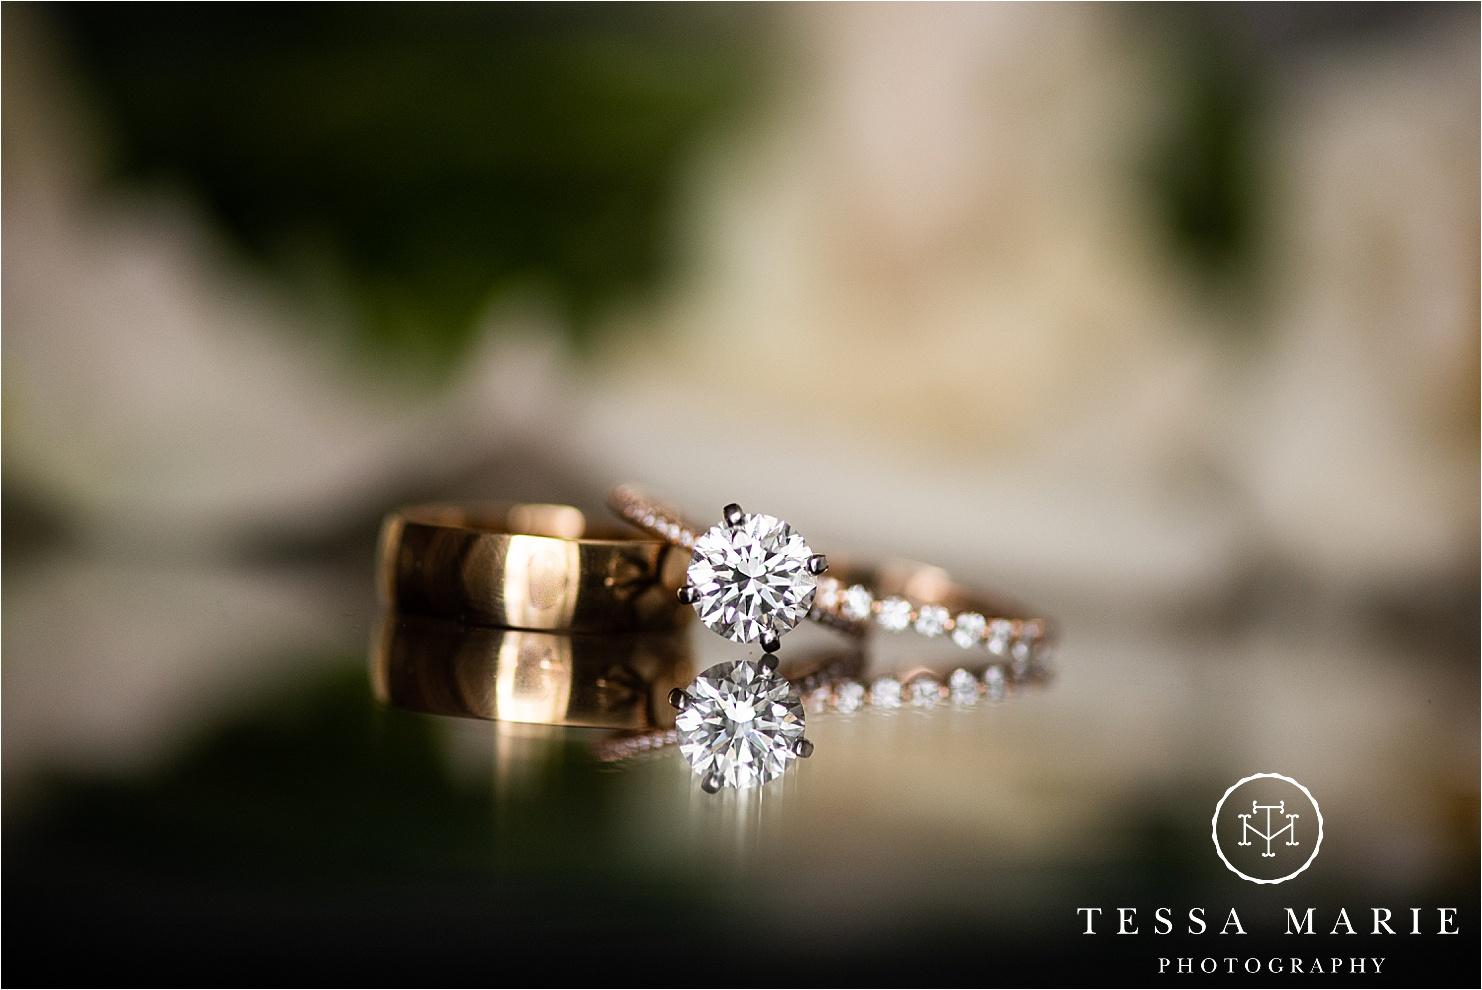 Tessa_marie_weddings_houston_wedding_photographer_The_astorian_0009.jpg